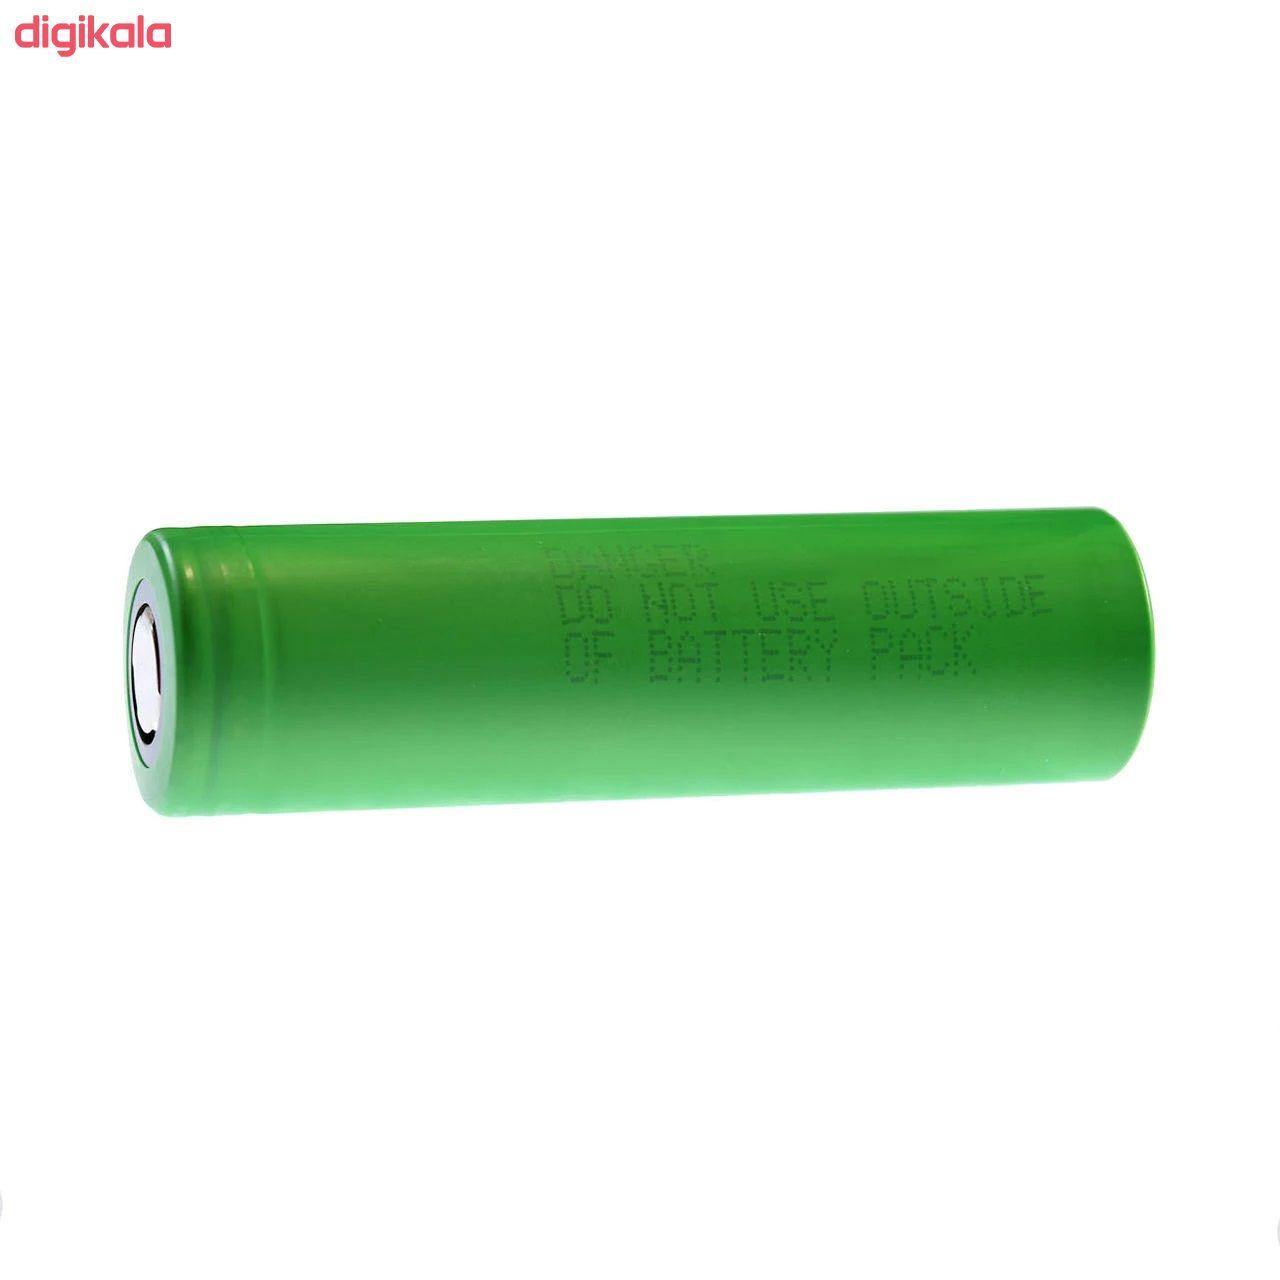 باتری لیتیوم-یون قابل شارژسونی مدل vtc -18650 ظرفیت 3000 میلی آمپرساعت main 1 6